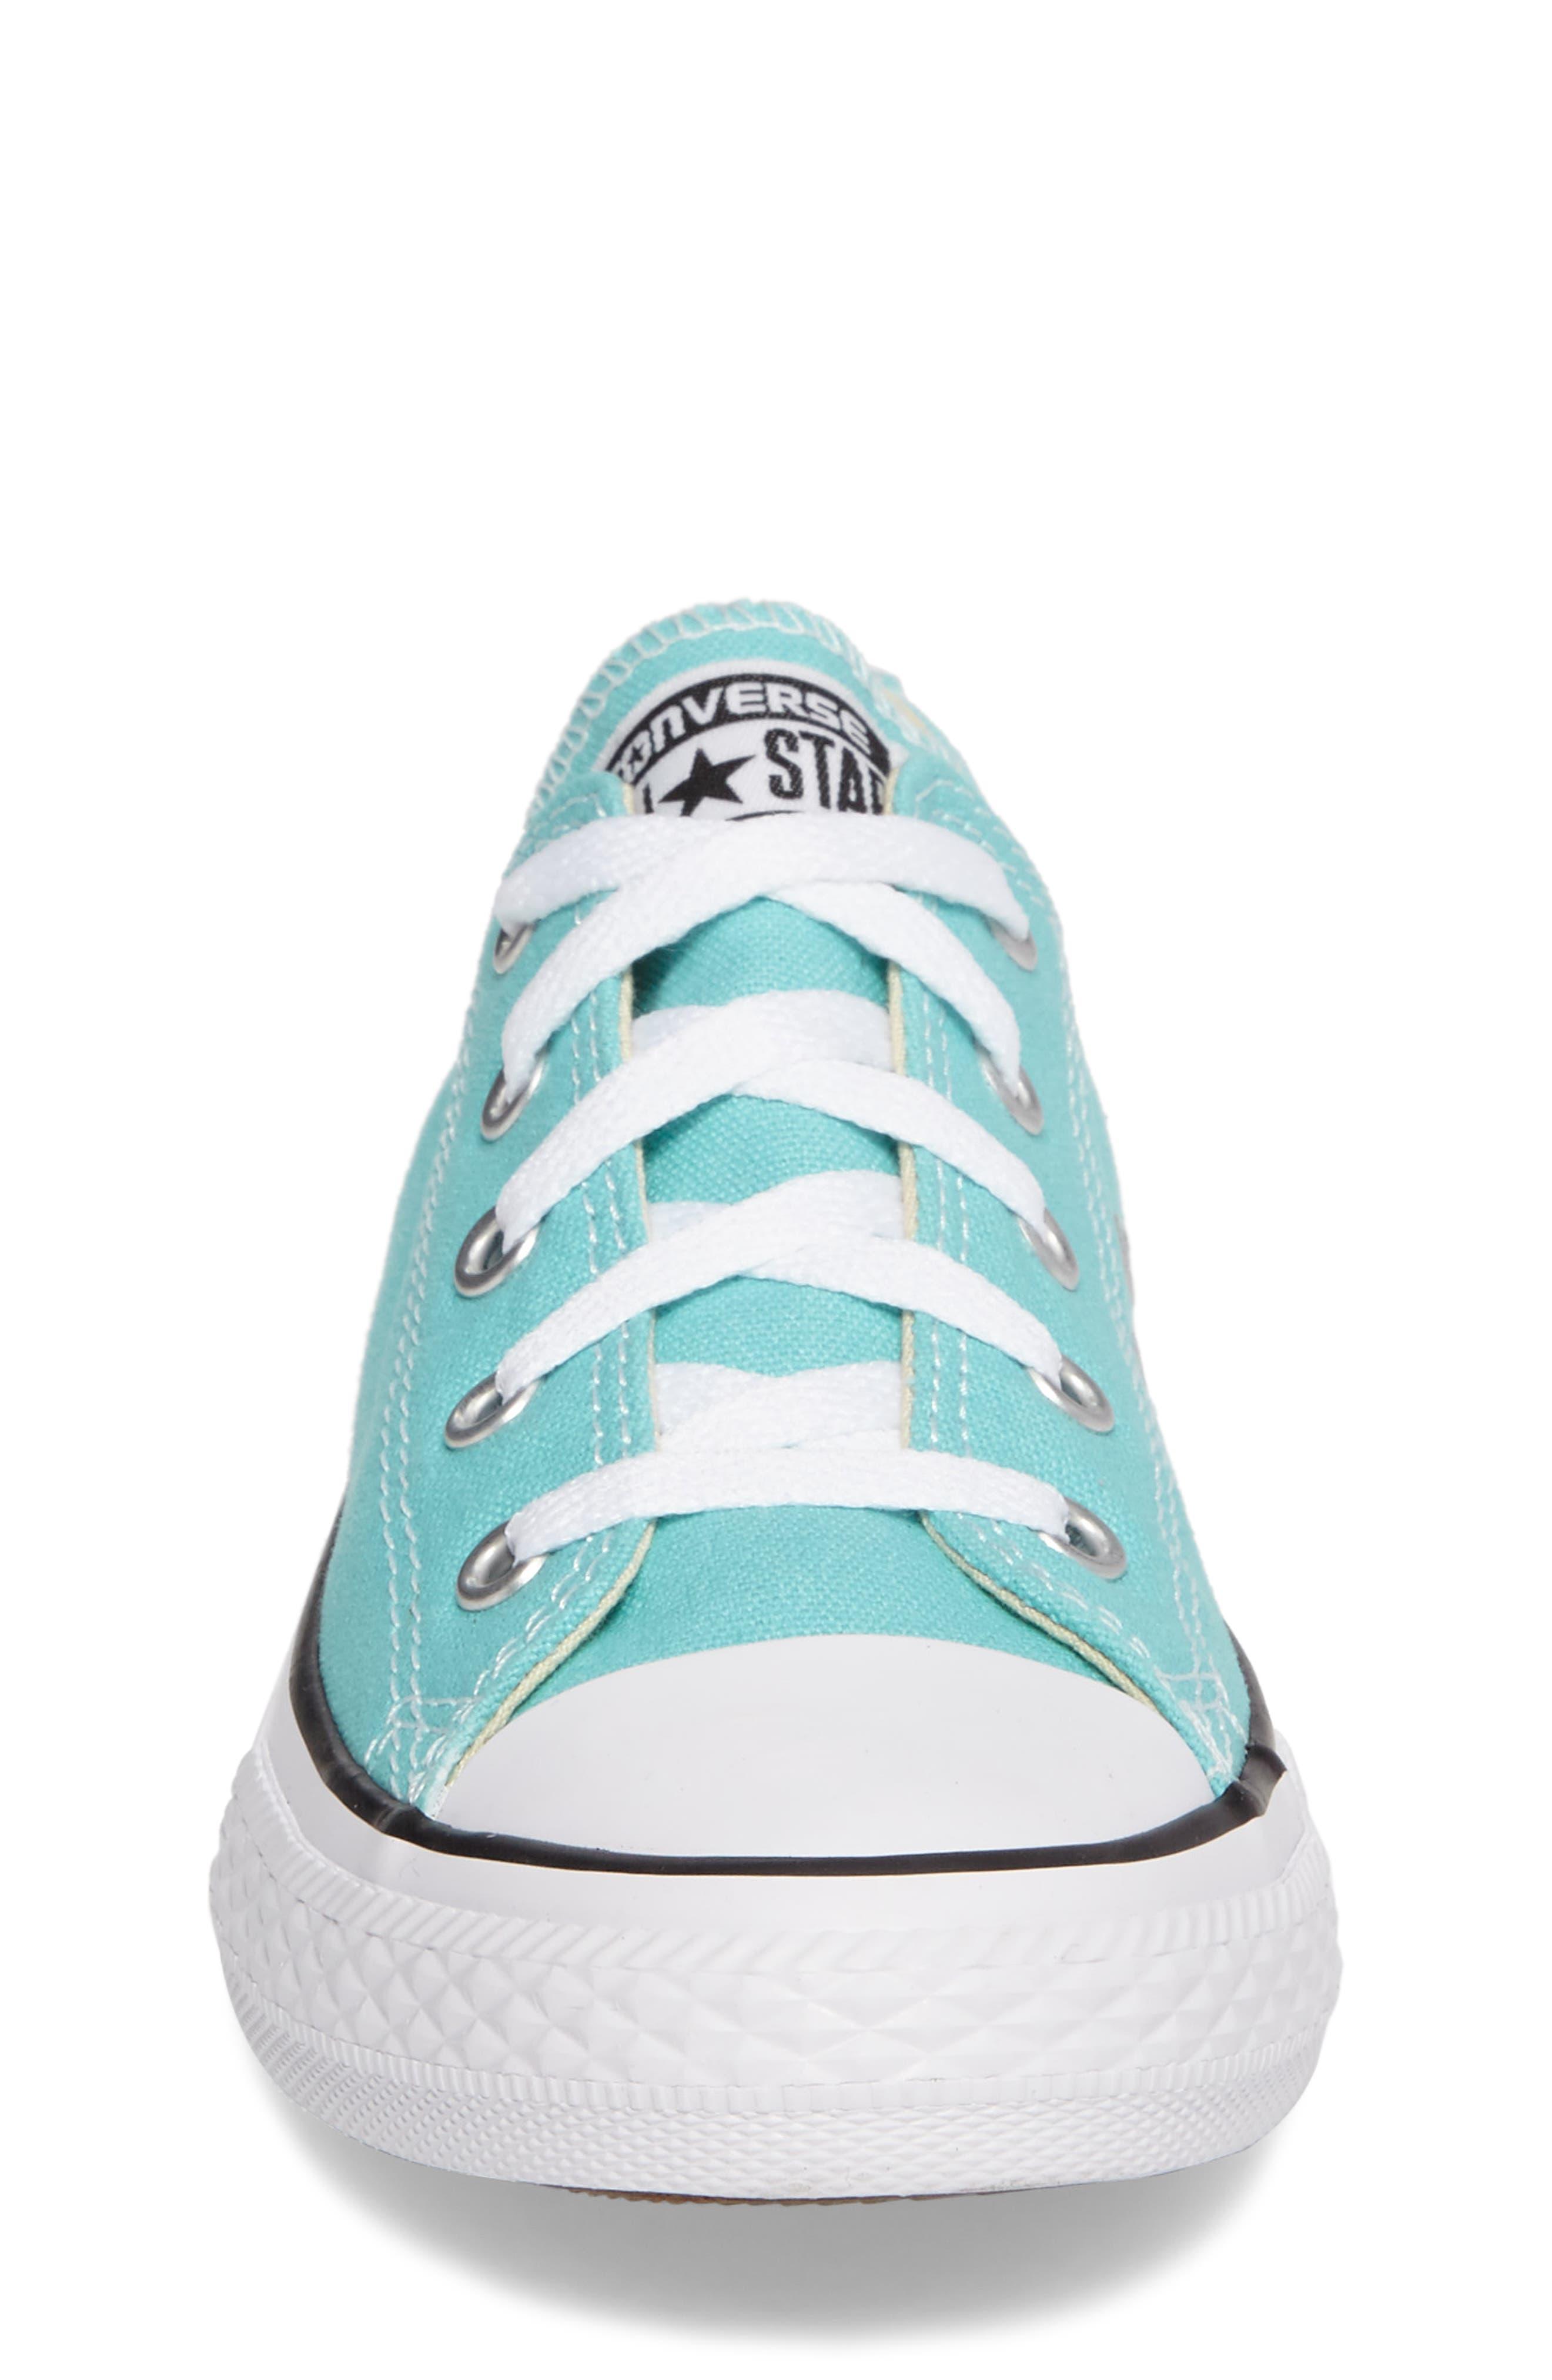 Chuck Taylor<sup>®</sup> All Star<sup>®</sup> Low Top Sneaker,                             Alternate thumbnail 4, color,                             Light Aqua/ Light Aqua